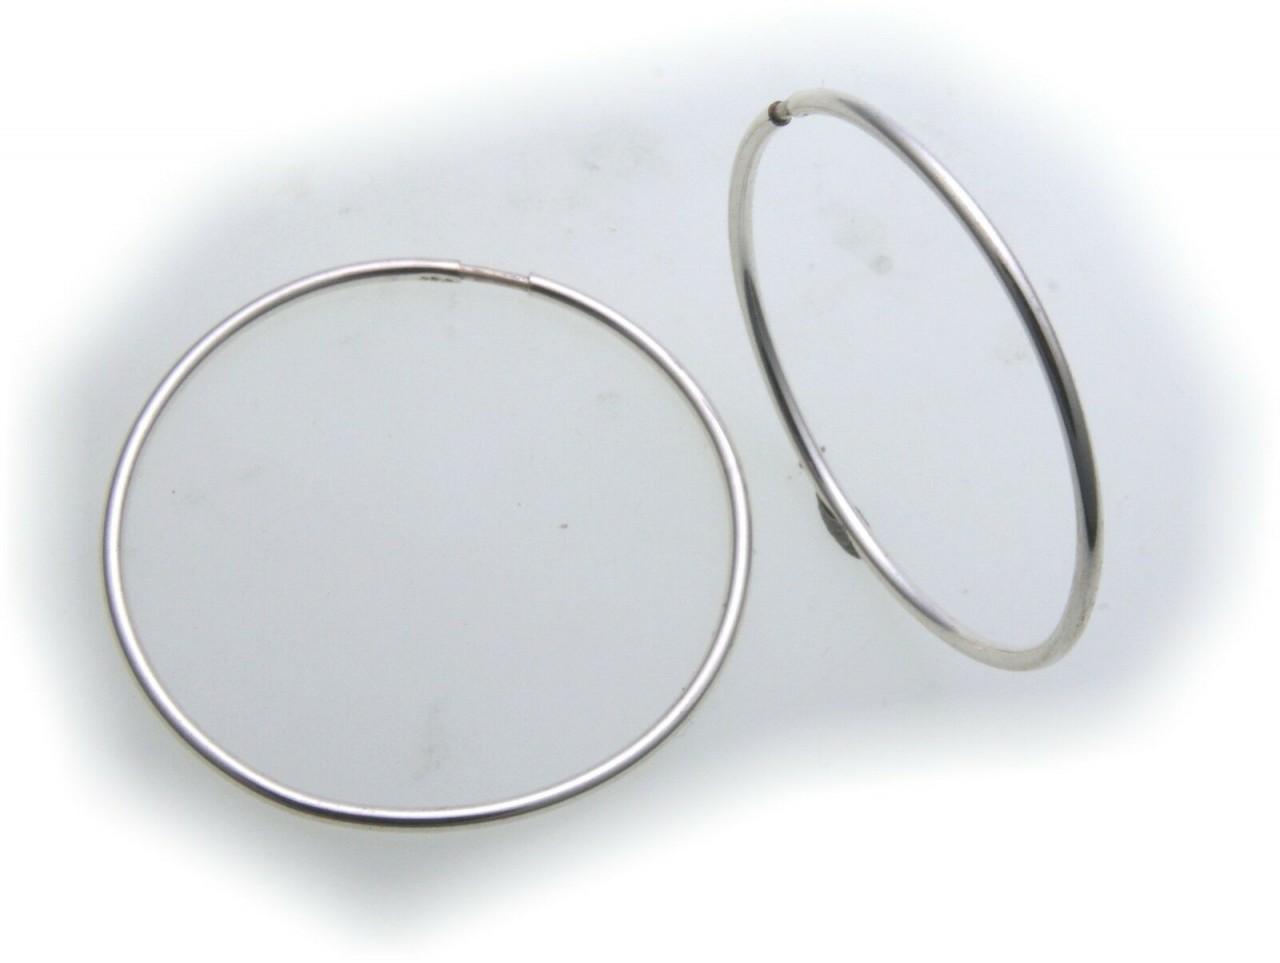 Ohrringe Creolen echt Silber 925 32 mm Rohrform 1,3 mm Sterlingsilber Unisex